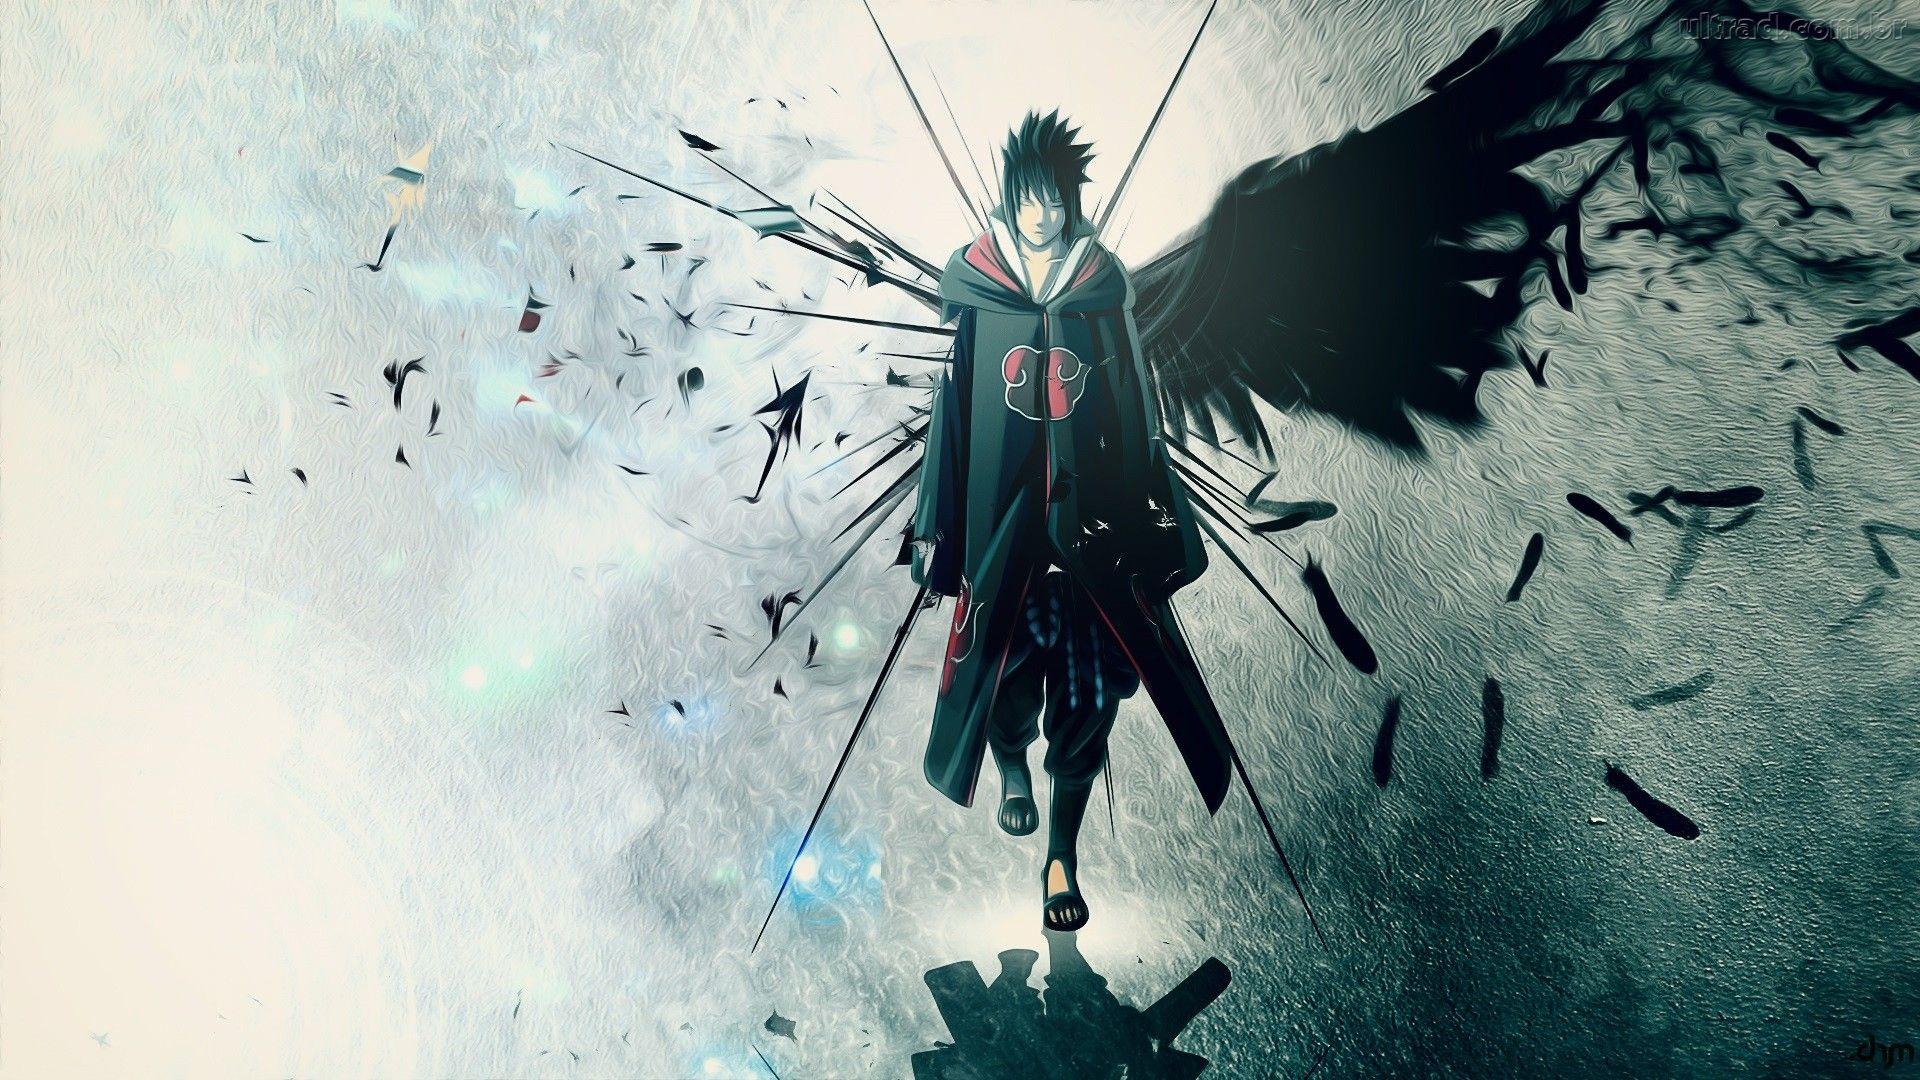 Sasuke Uchiha Wallpapers High Quality | Download Free